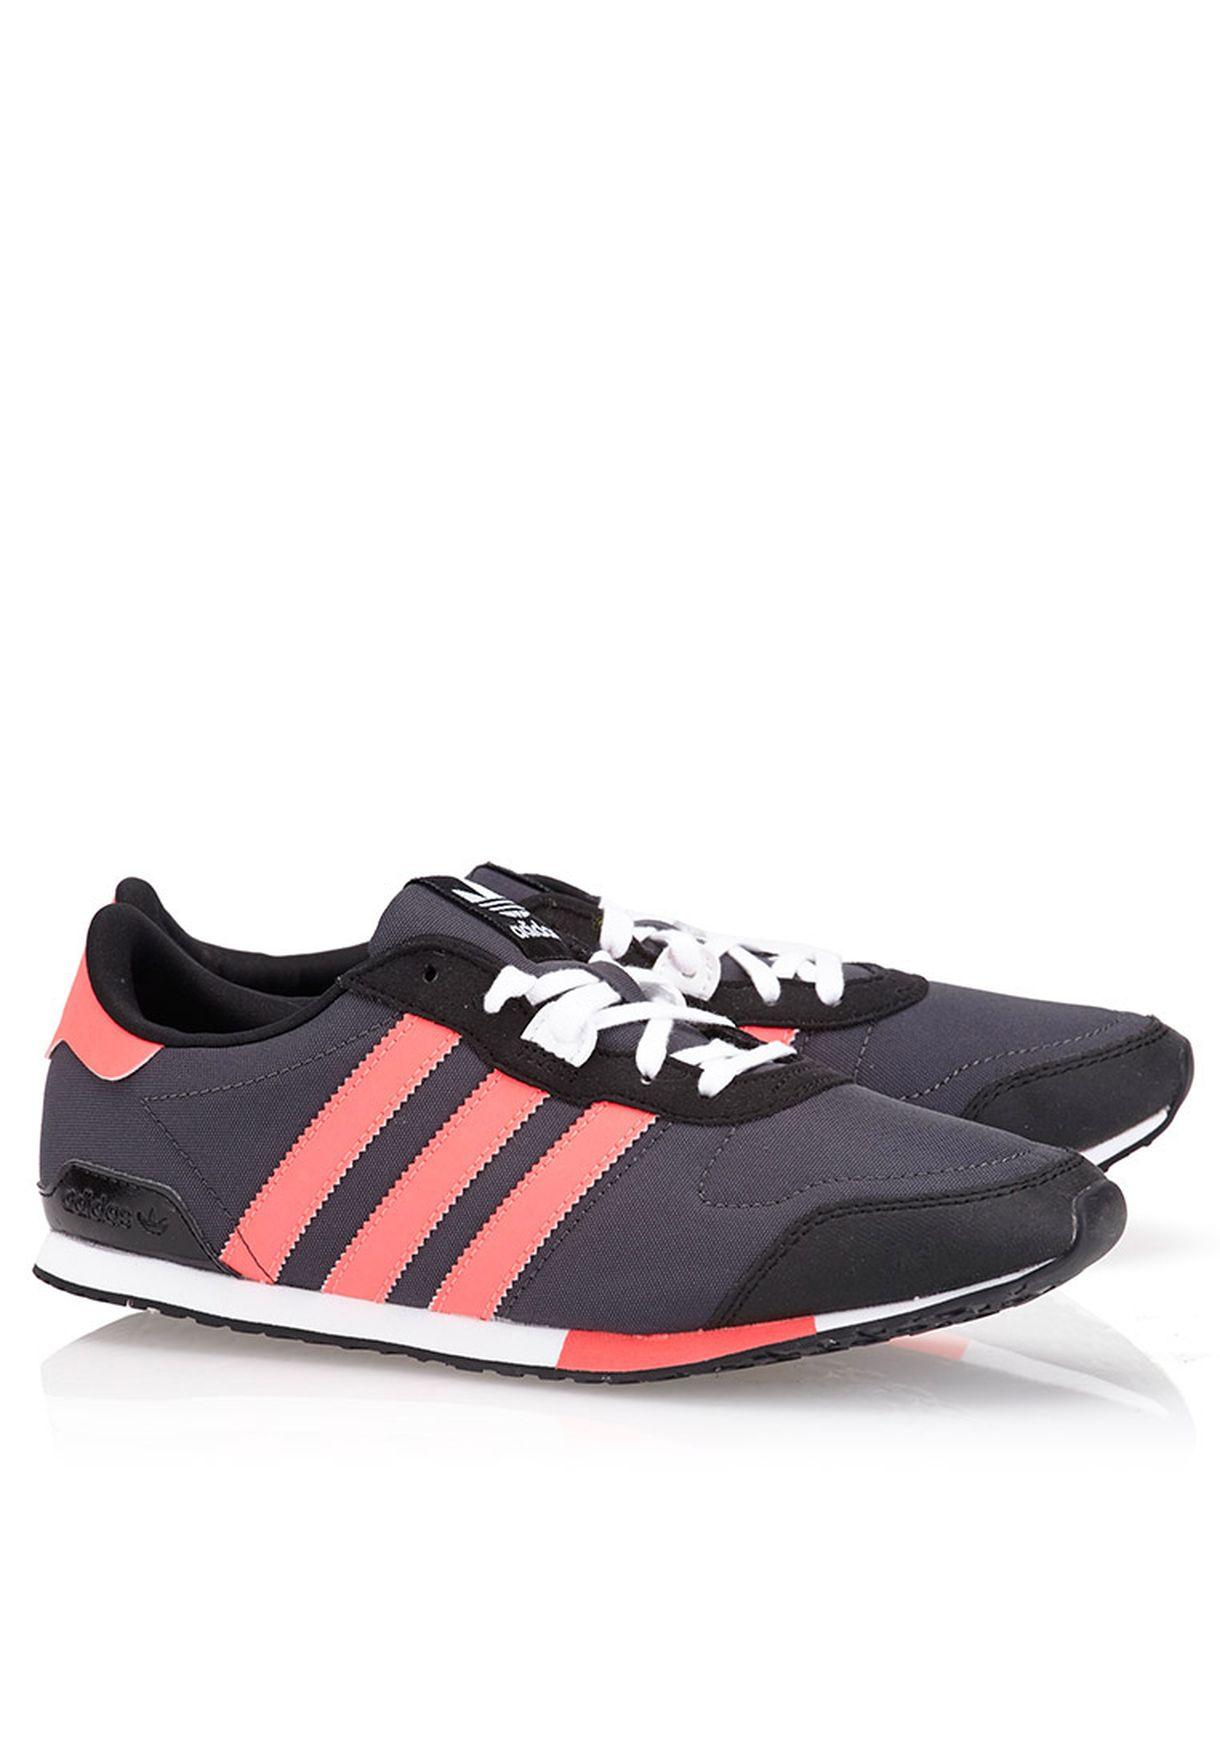 eed1970247393 Shop adidas Originals black Zx 700 Be Lo Sneakers M19382 for Women ...